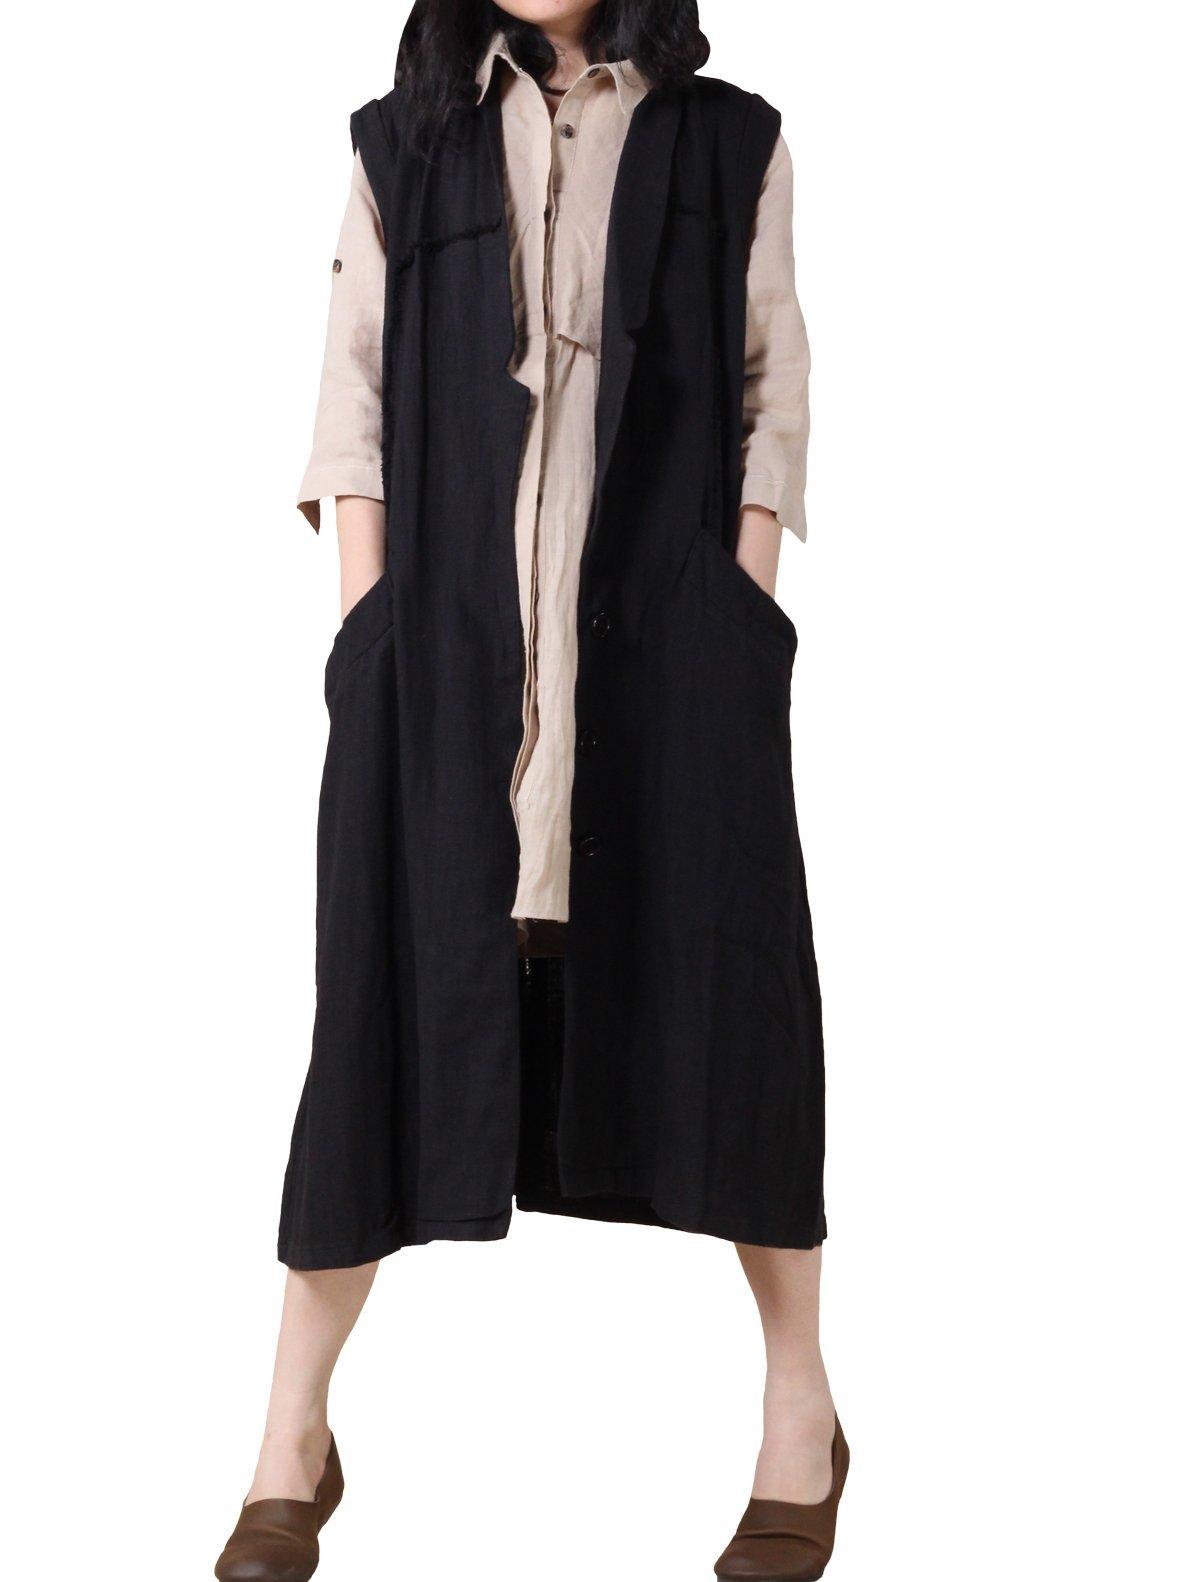 Mordenmiss Women's New Loose Sleeveless Vest Coat Style 1-M-Black